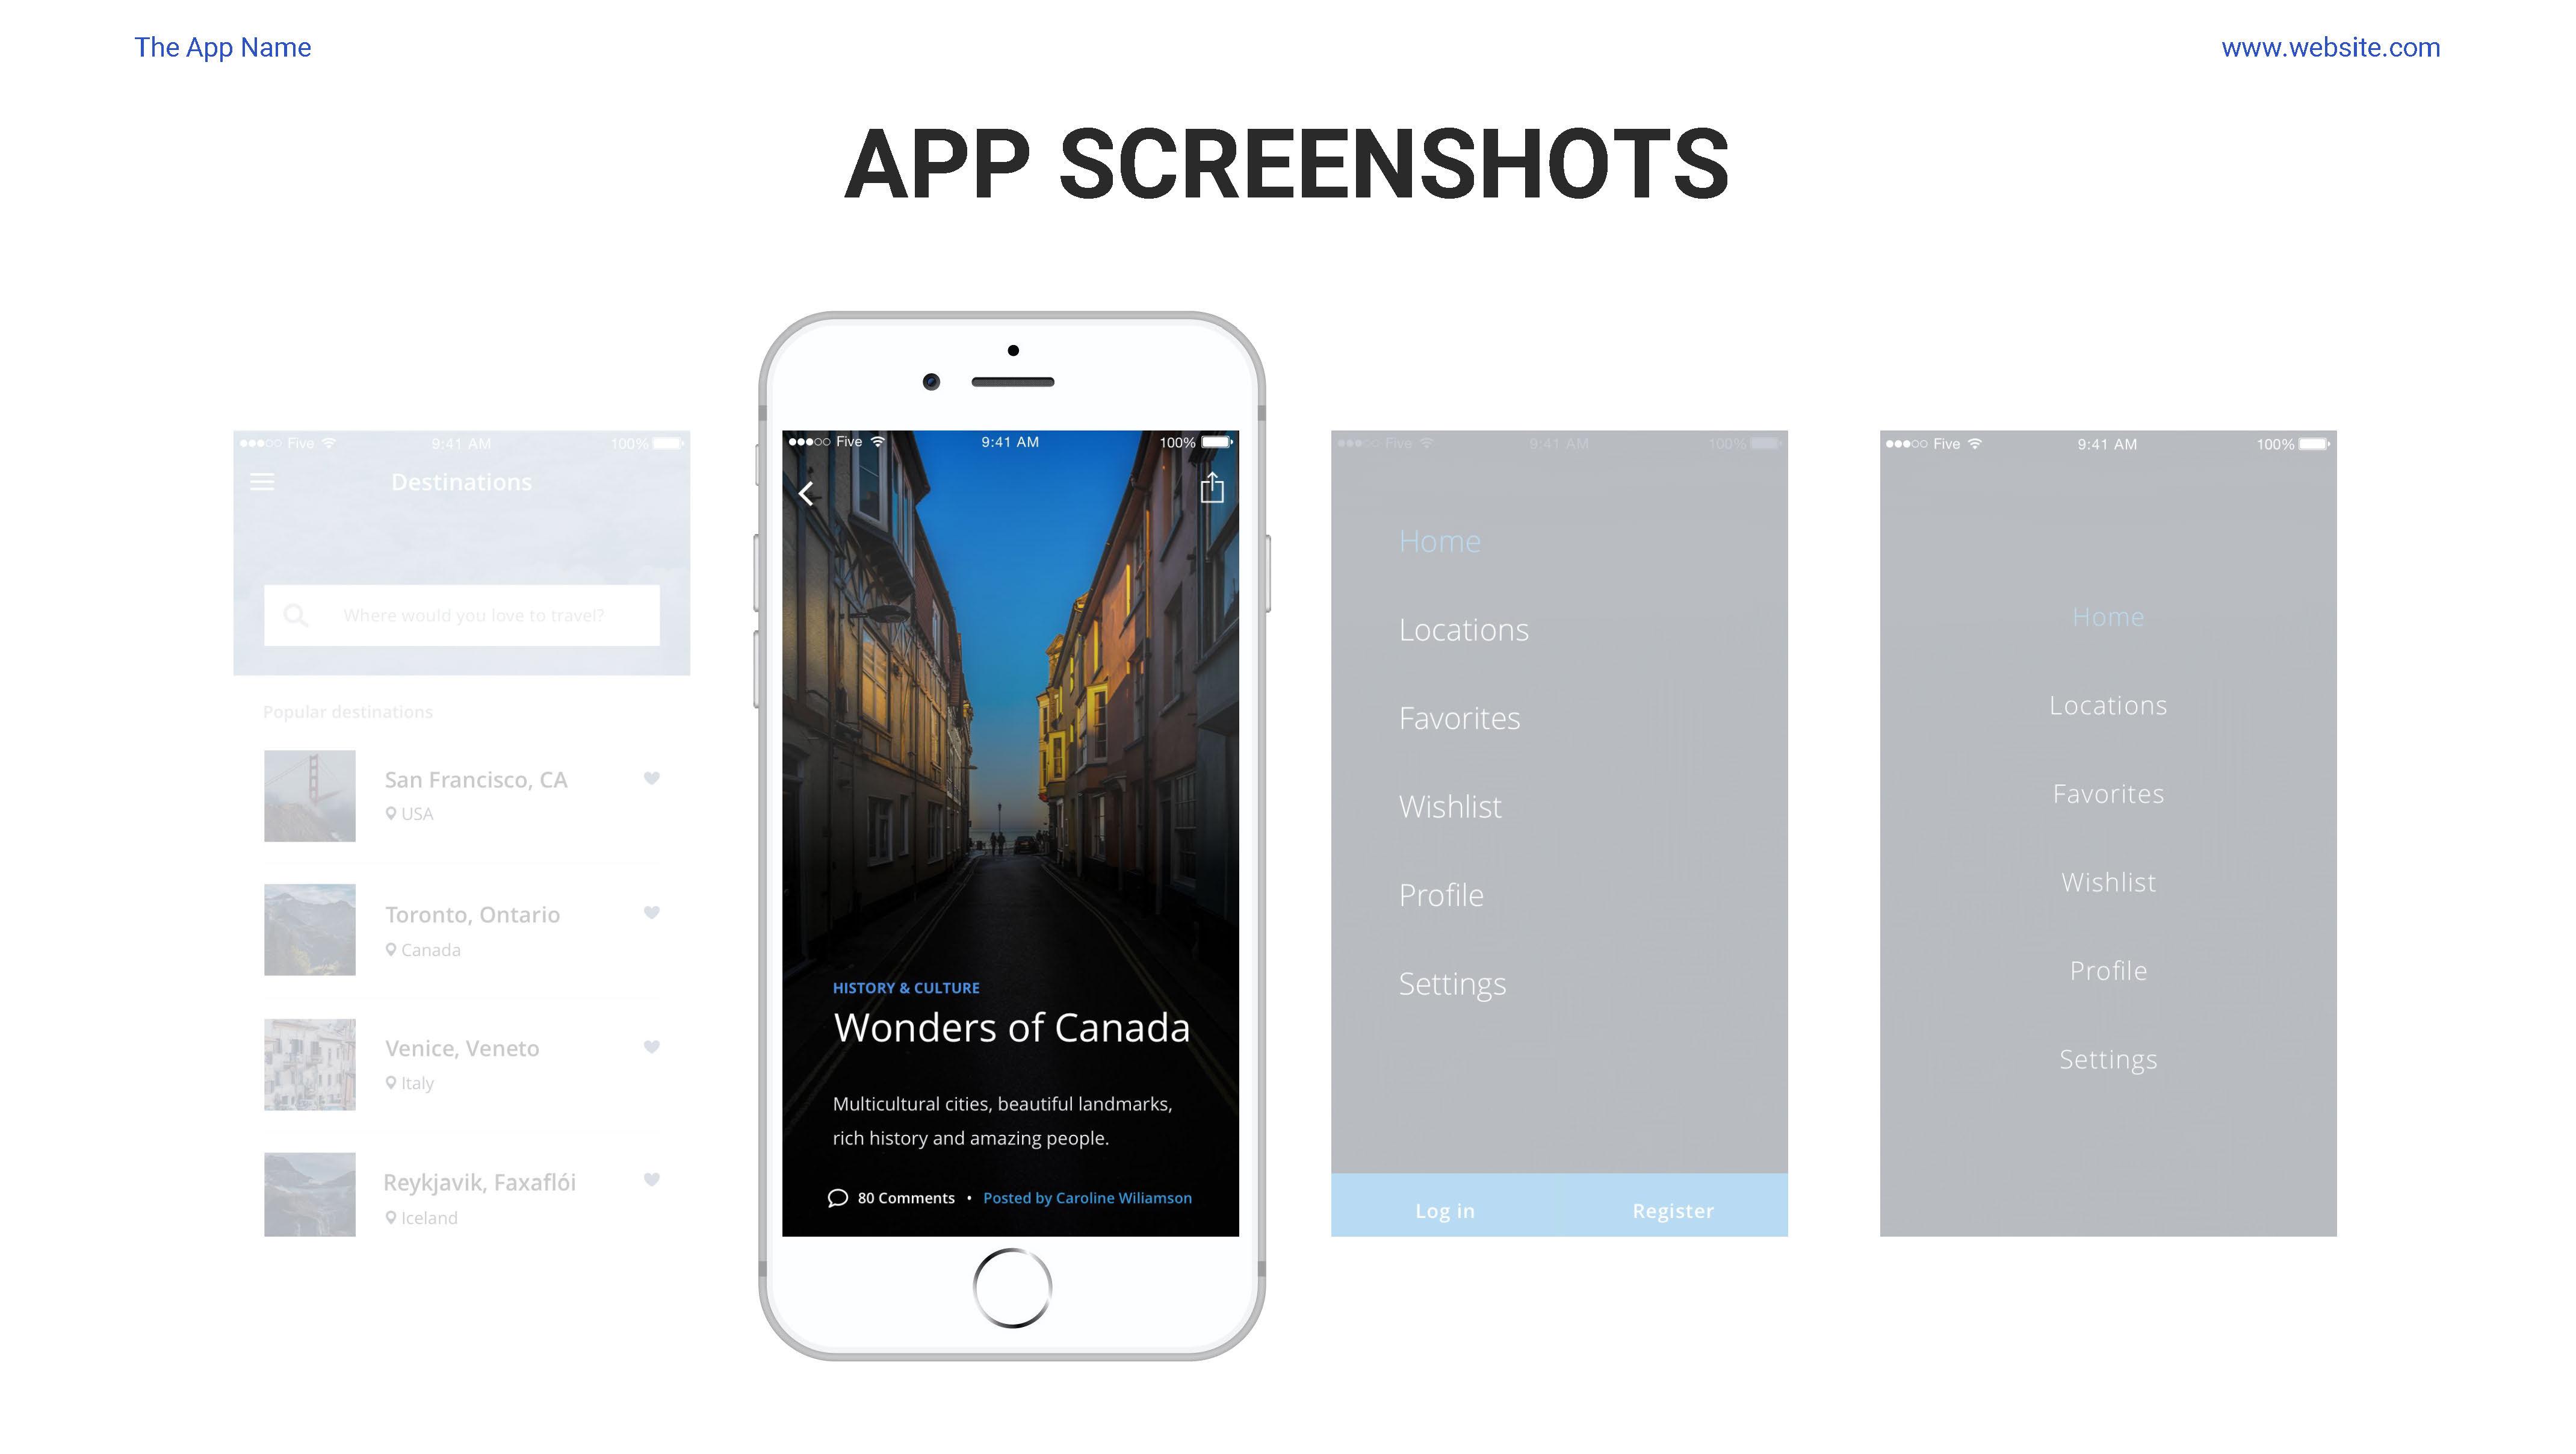 Mobile App Showcase Google Slides Pitch Deck by Spriteit   GraphicRiver